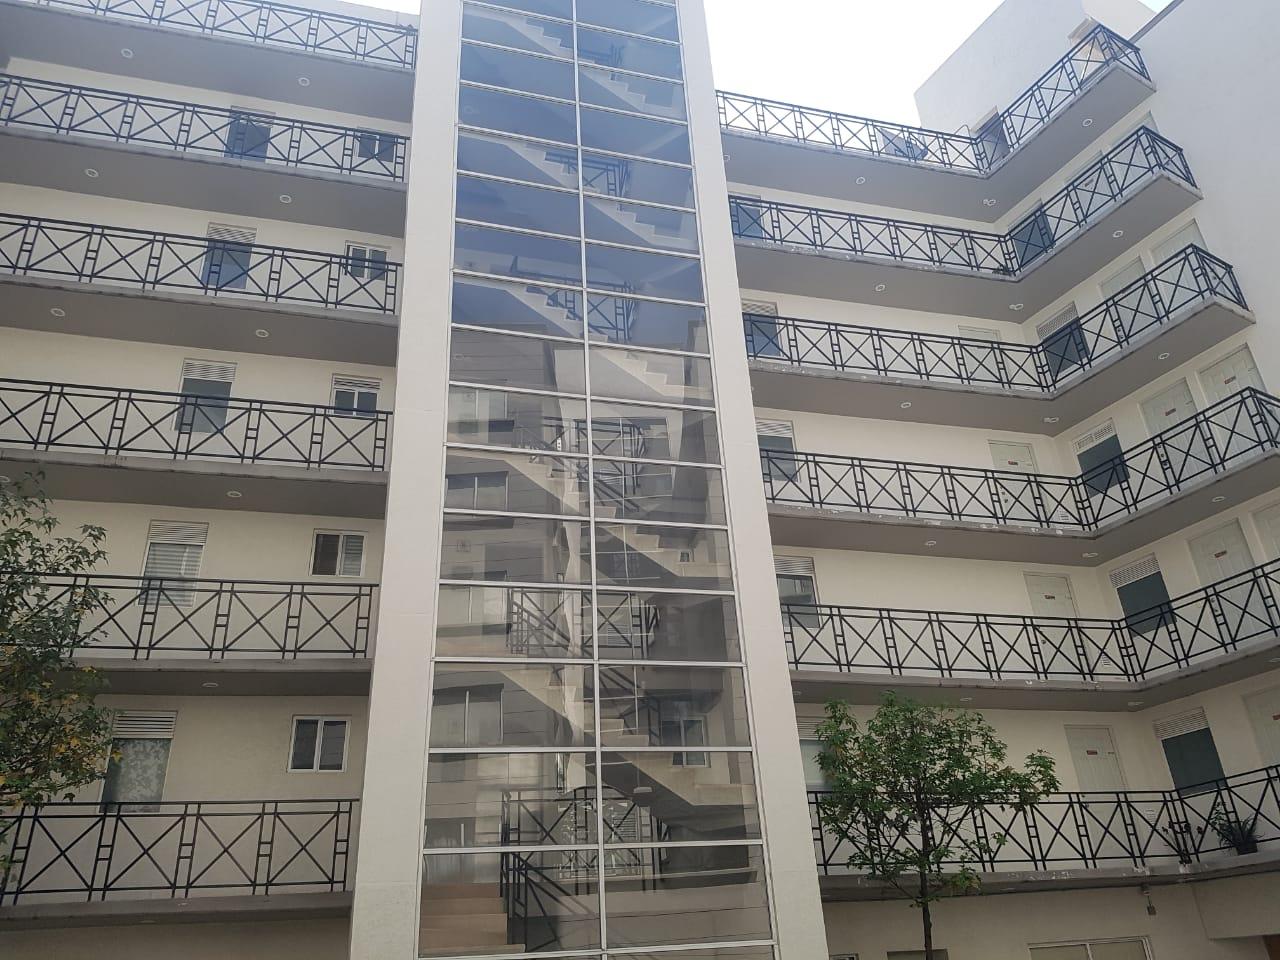 Departamento 5to piso, RoofGarden privado